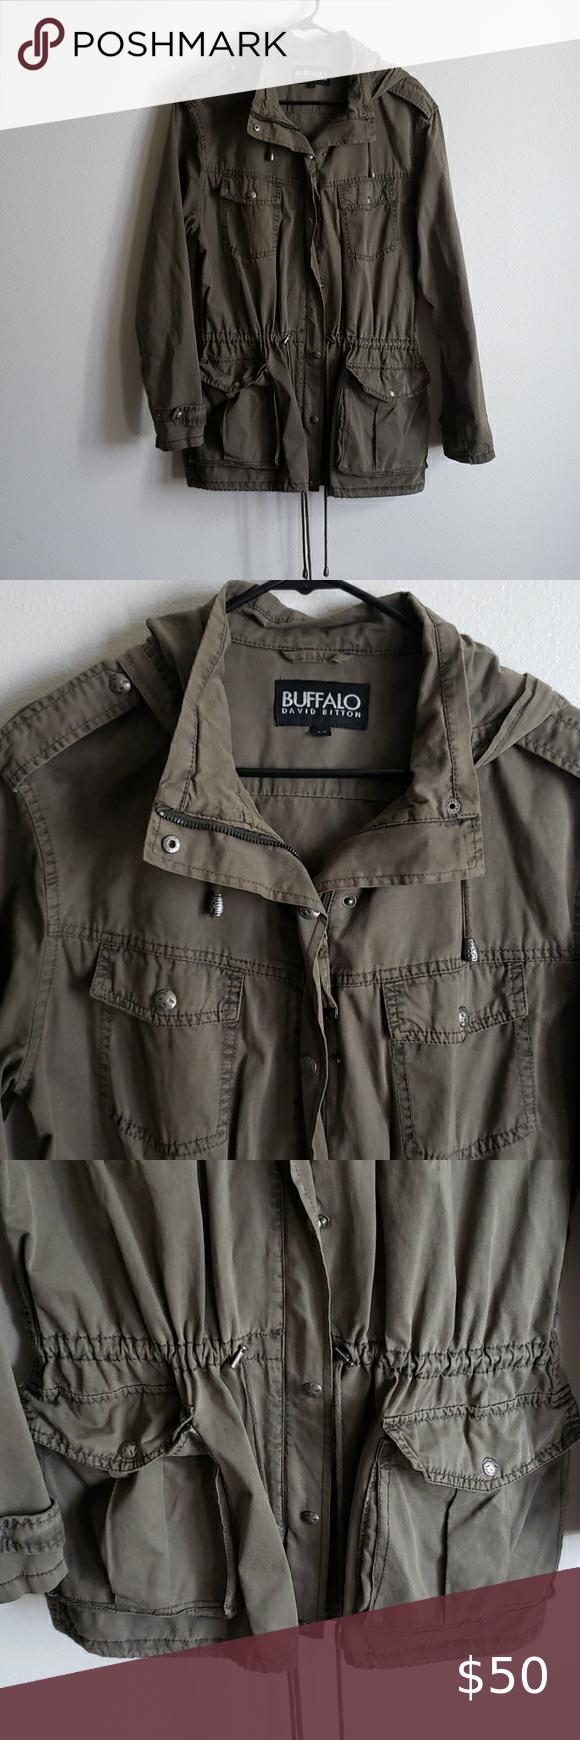 Buffalo David Bitton Utility Jacket Utility Jacket Jackets Clothes Design [ 1740 x 580 Pixel ]